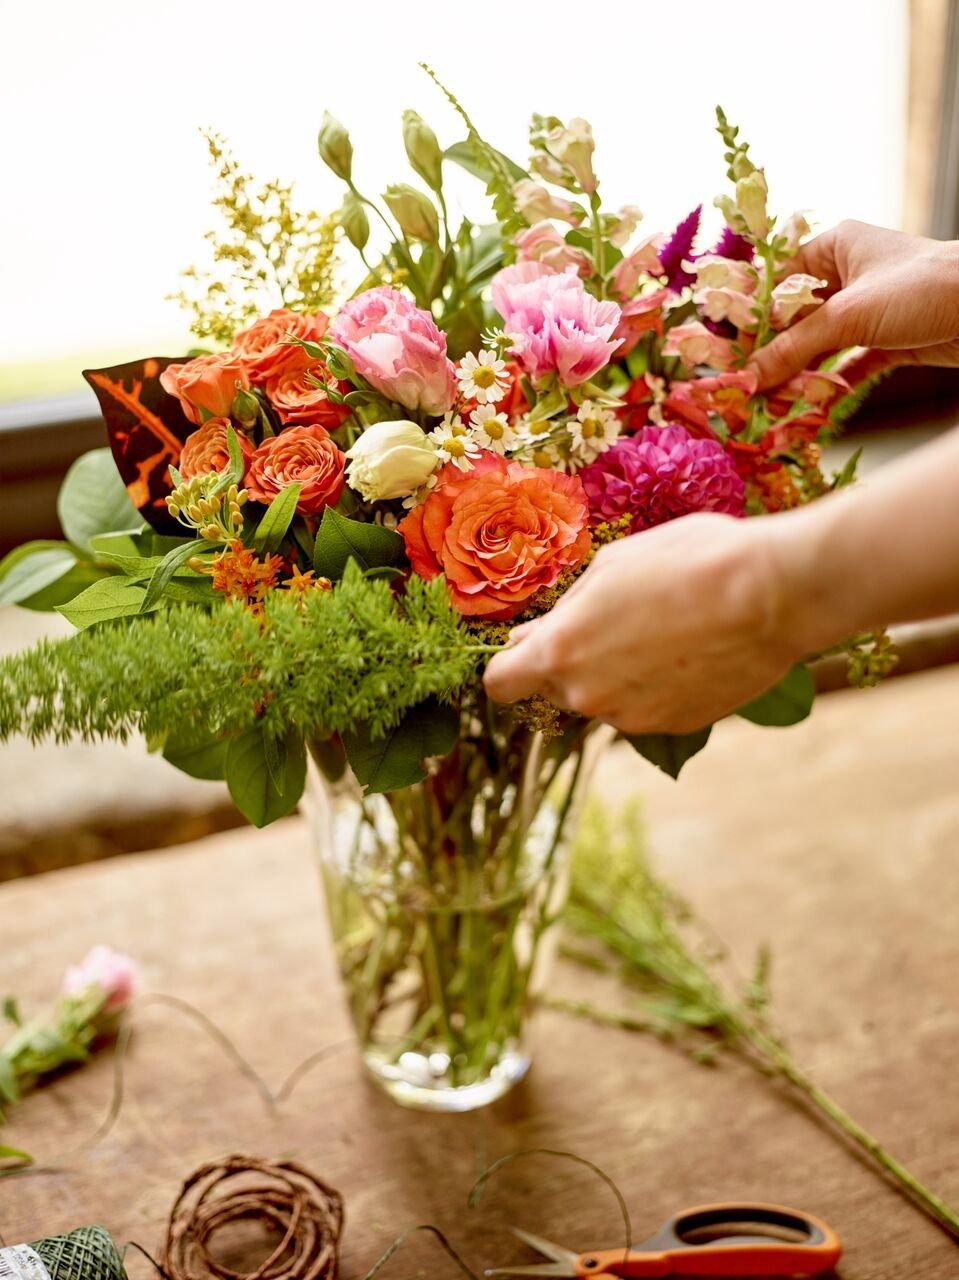 Close up of blooms in flower arrangement